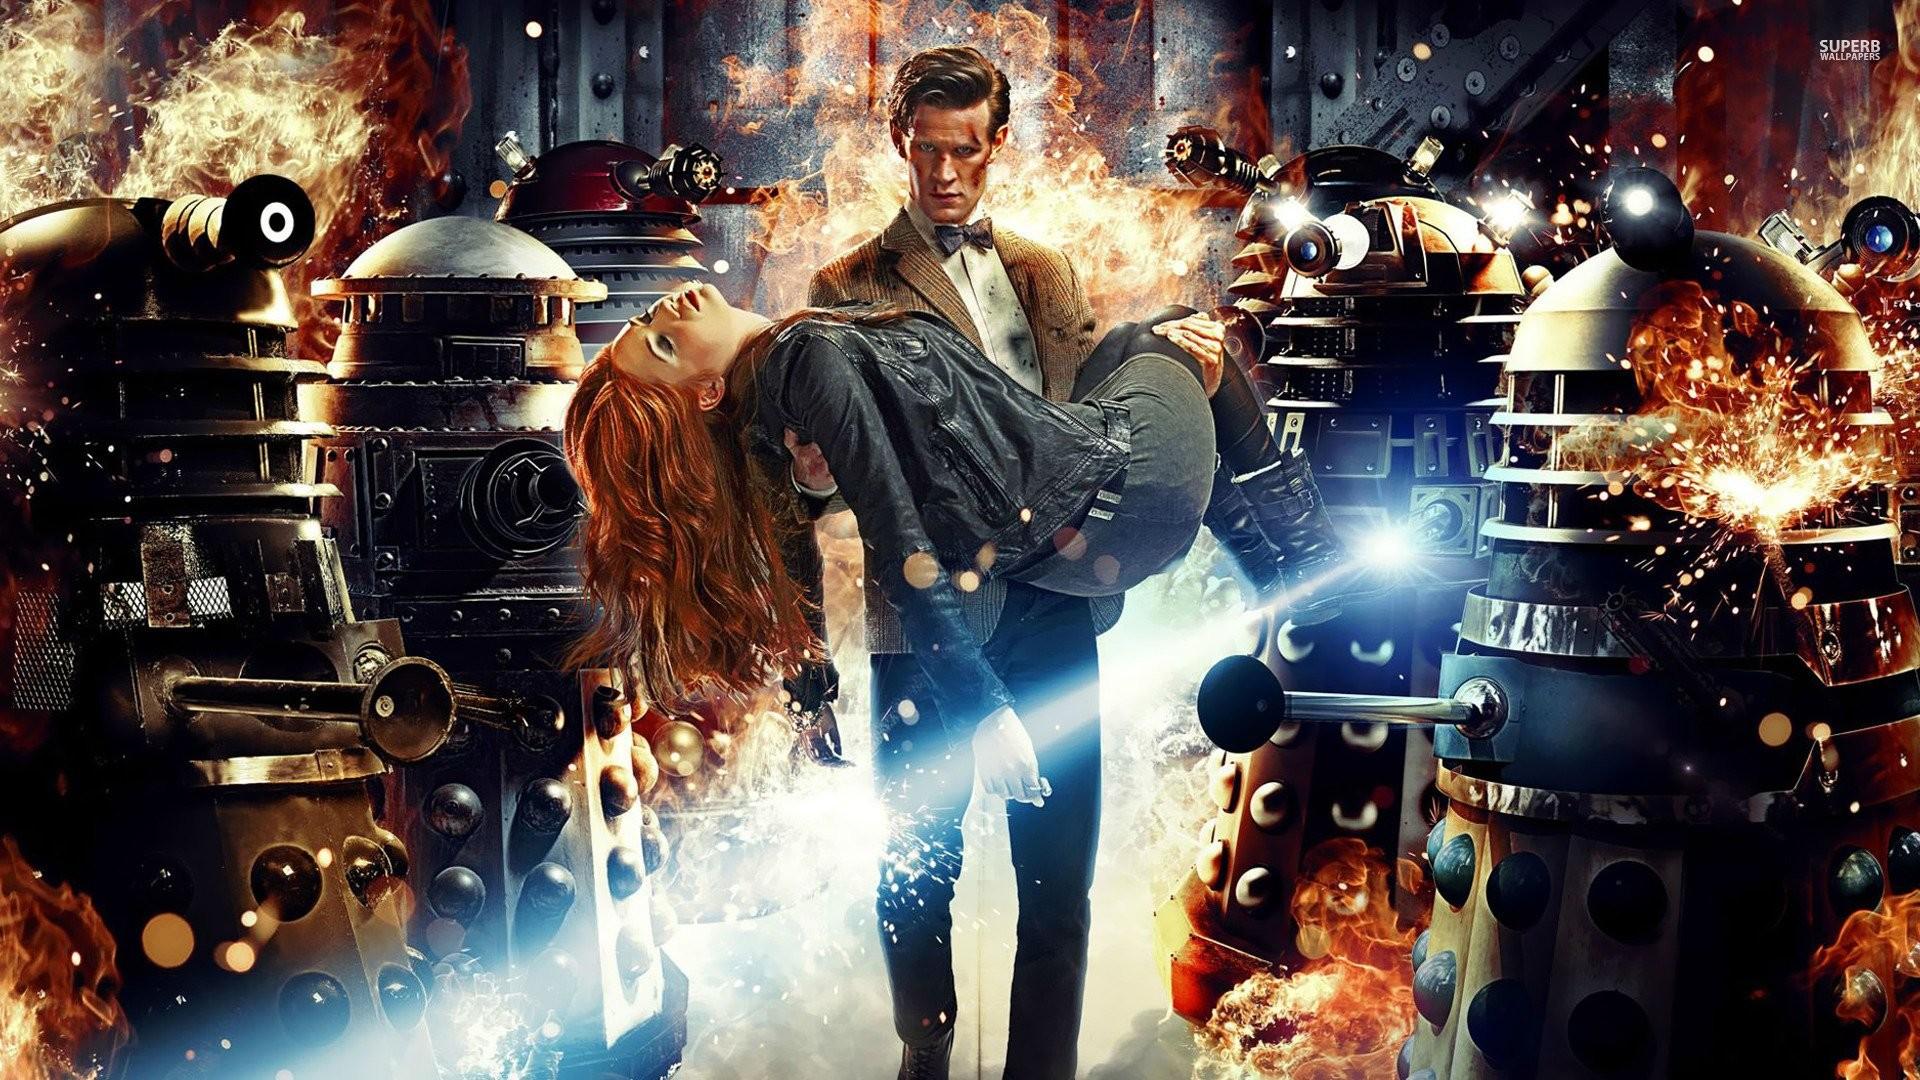 Doctor Who Matt Smith Wallpaper 1920×1080 Doctor Who Wallpapers Matt Smith  (46 Wallpapers